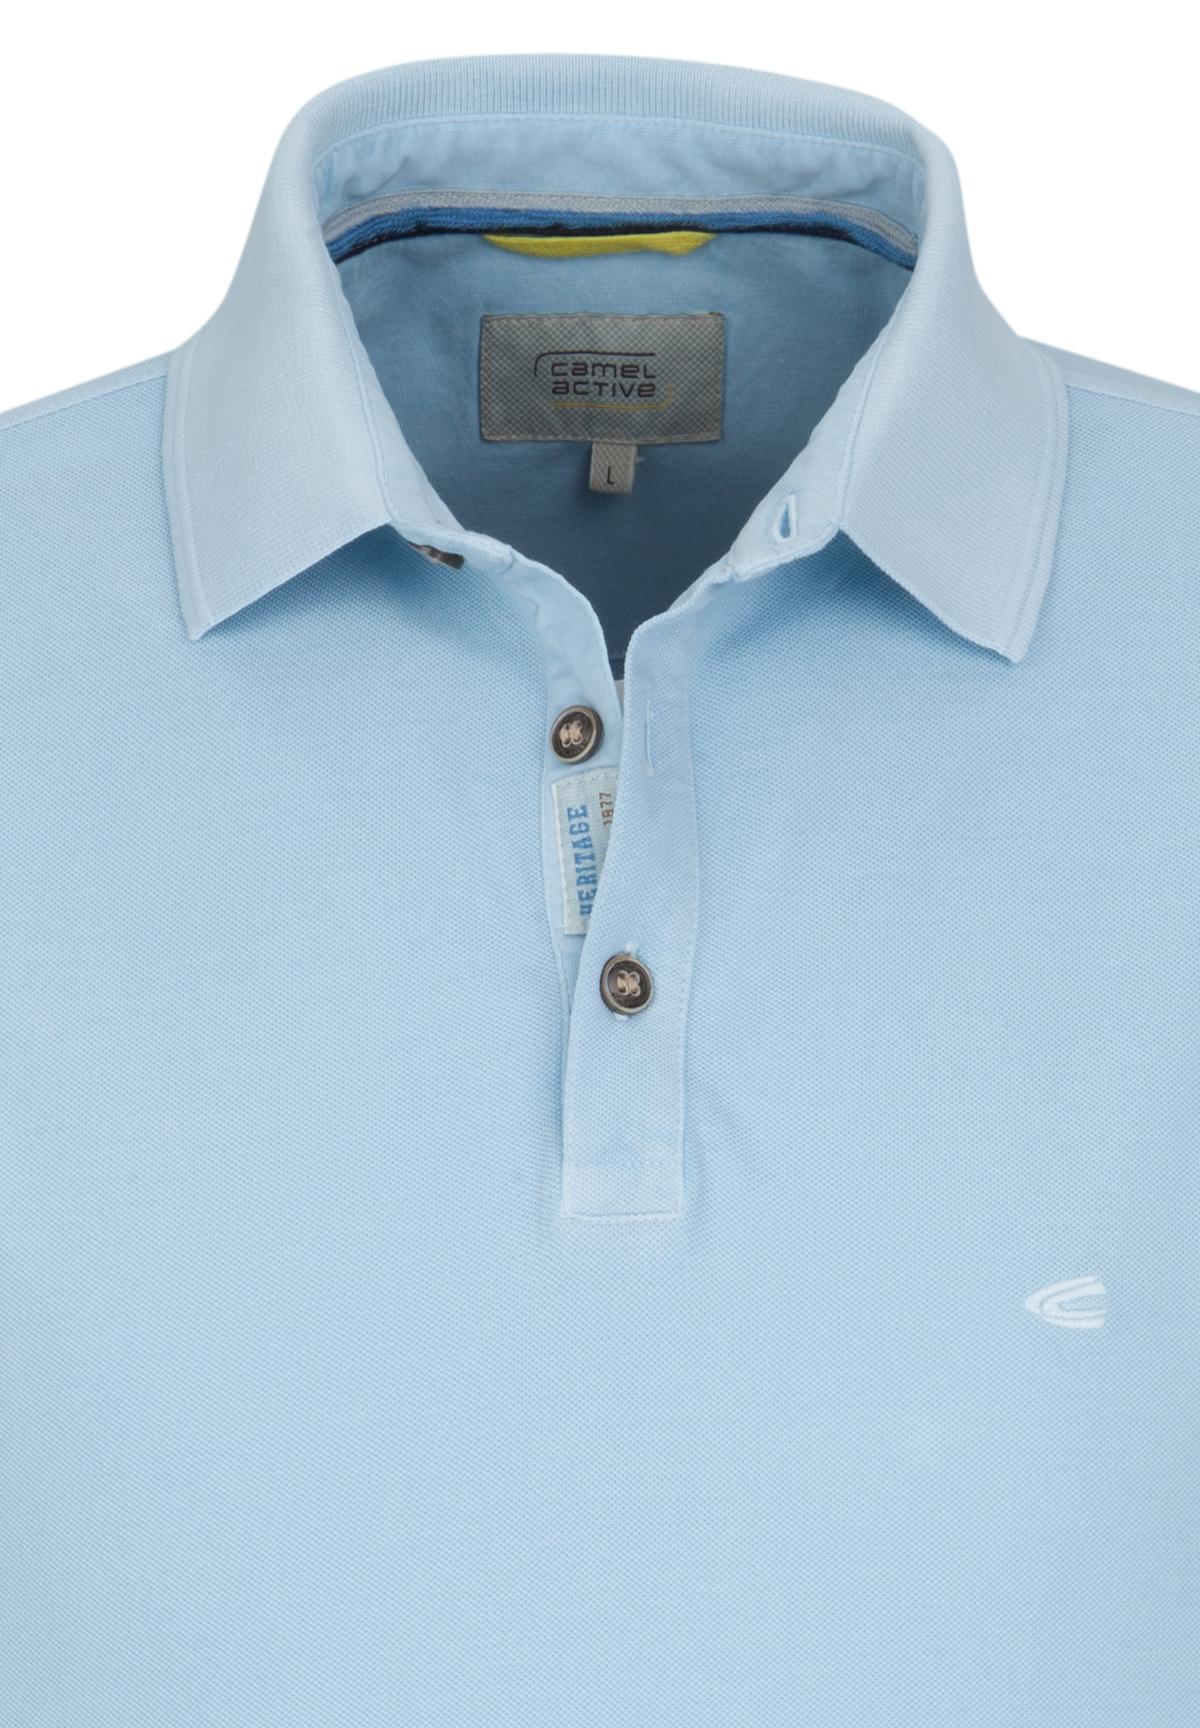 Camel-Active-Herren-Shirt-Poloshirt-Pique-Regular-Fit-NEU Indexbild 15